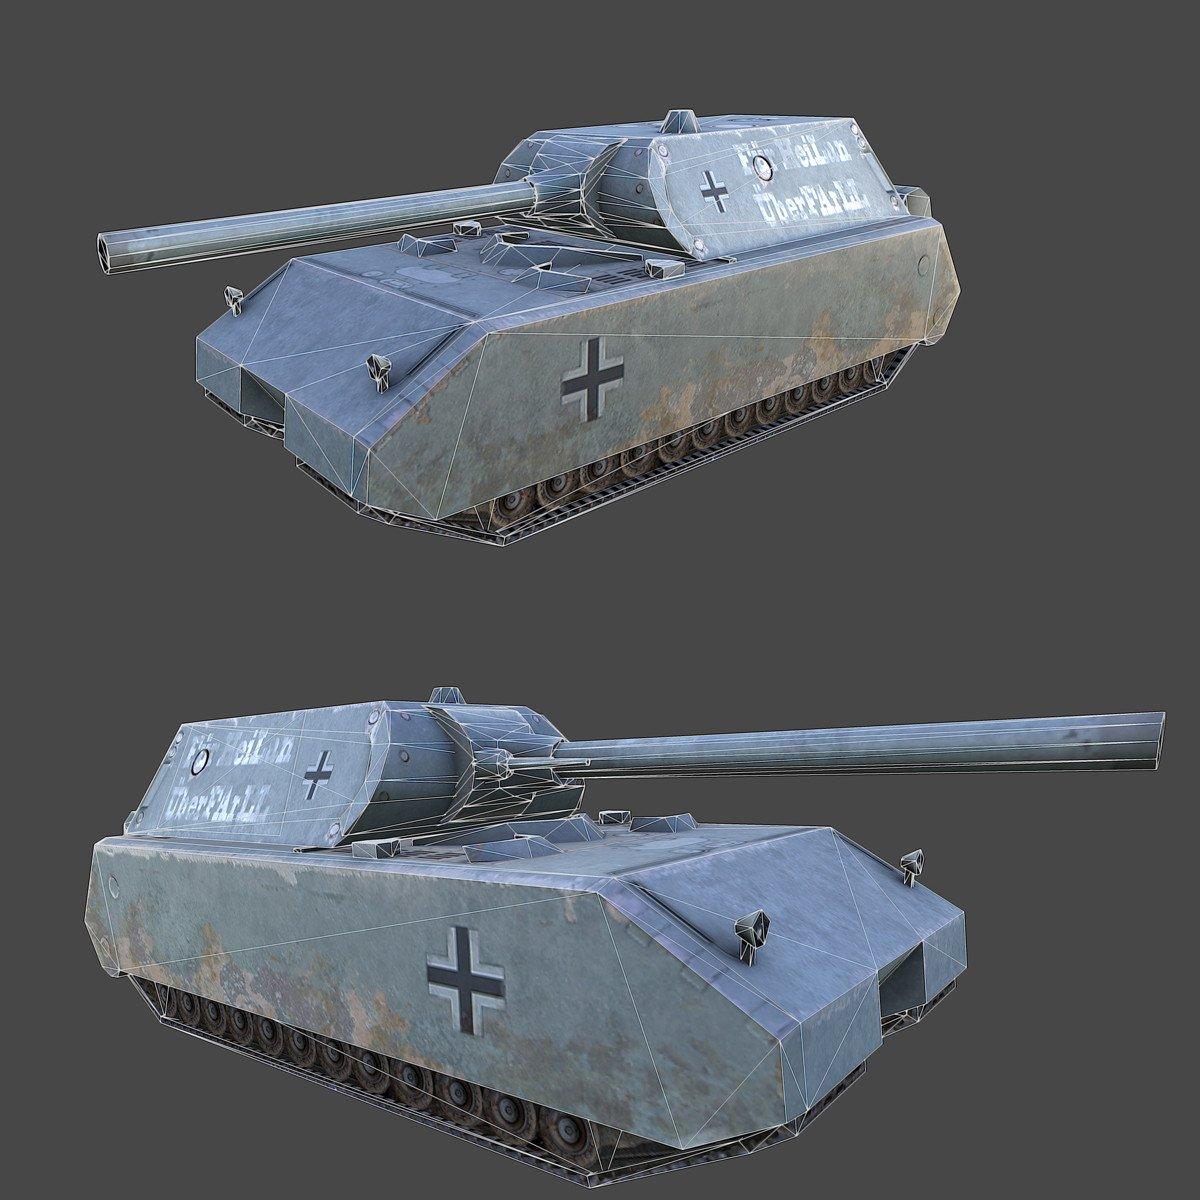 Ww2 Maus Tank Downloadfree3d Com